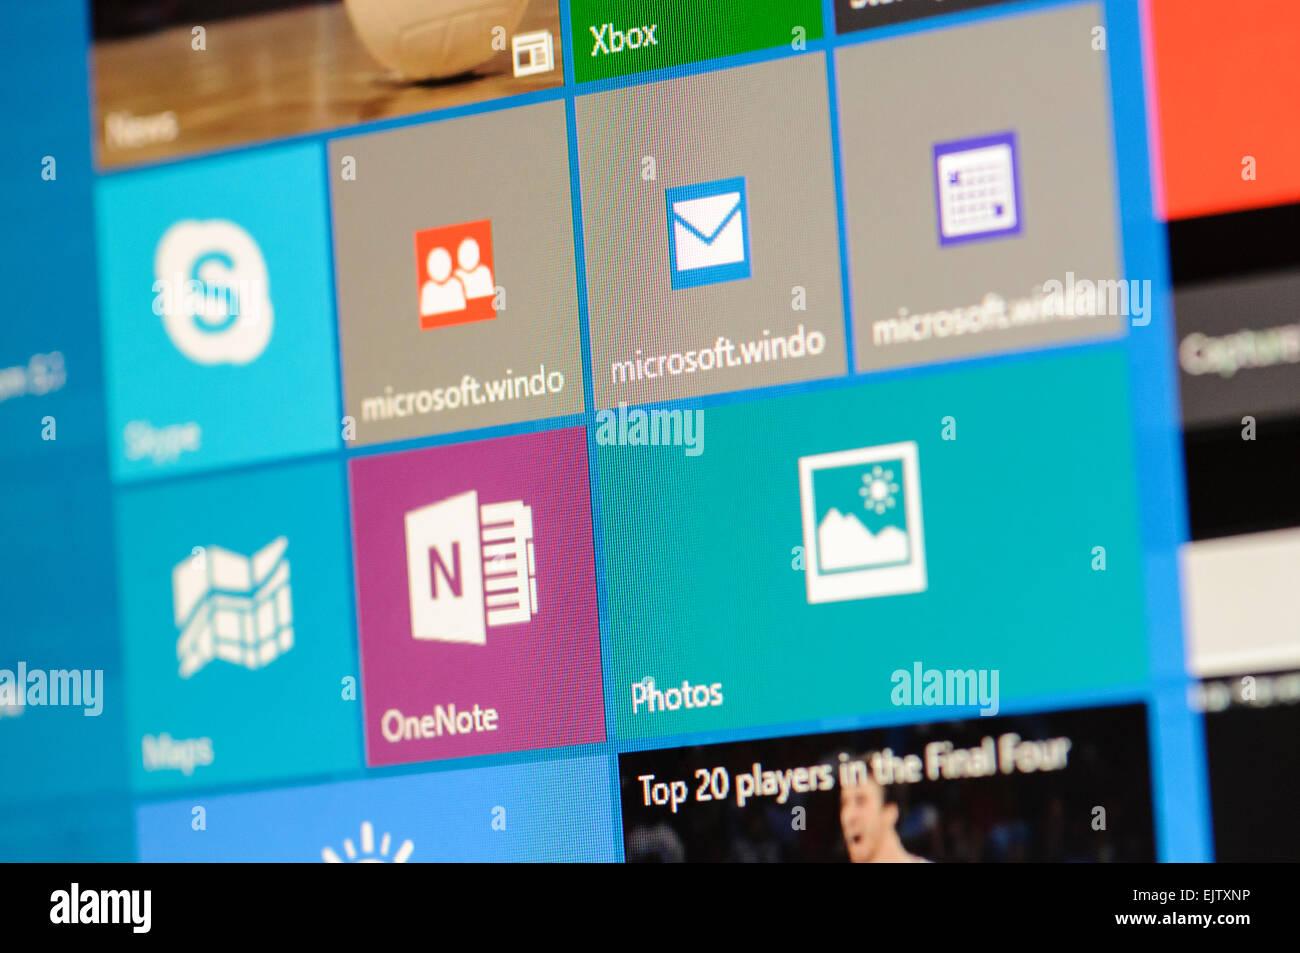 Tiles on the Windows 10 start menu - Stock Image